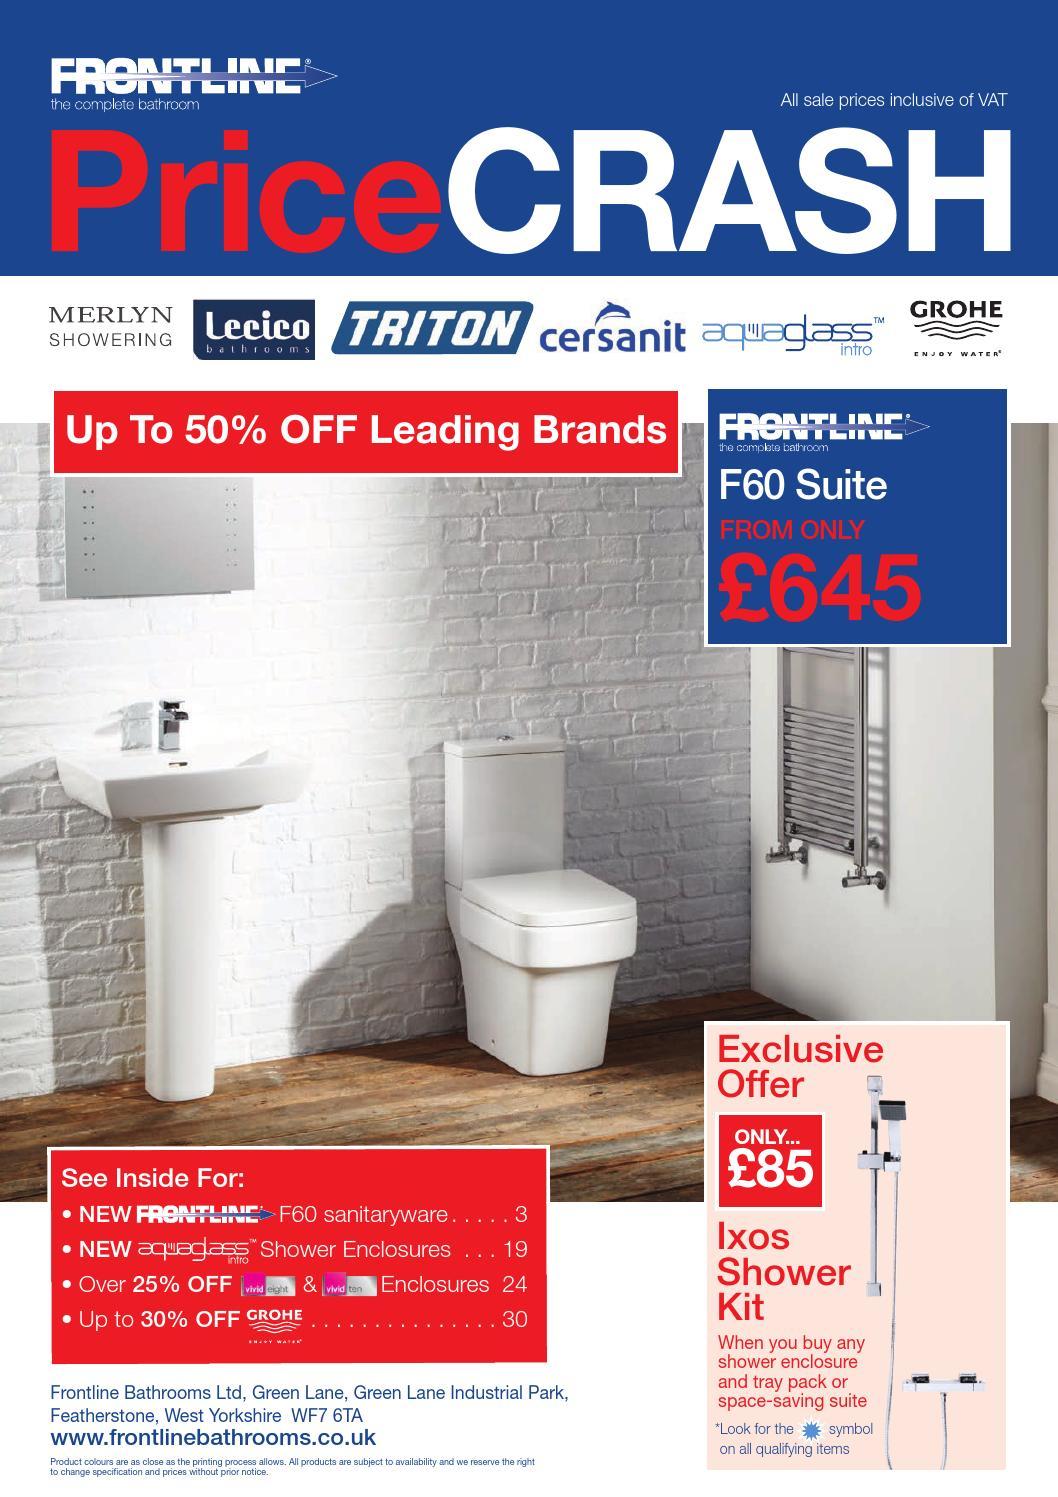 Frontline Price crash 2014 by Rubberduck Bathrooms Ltd - issuu